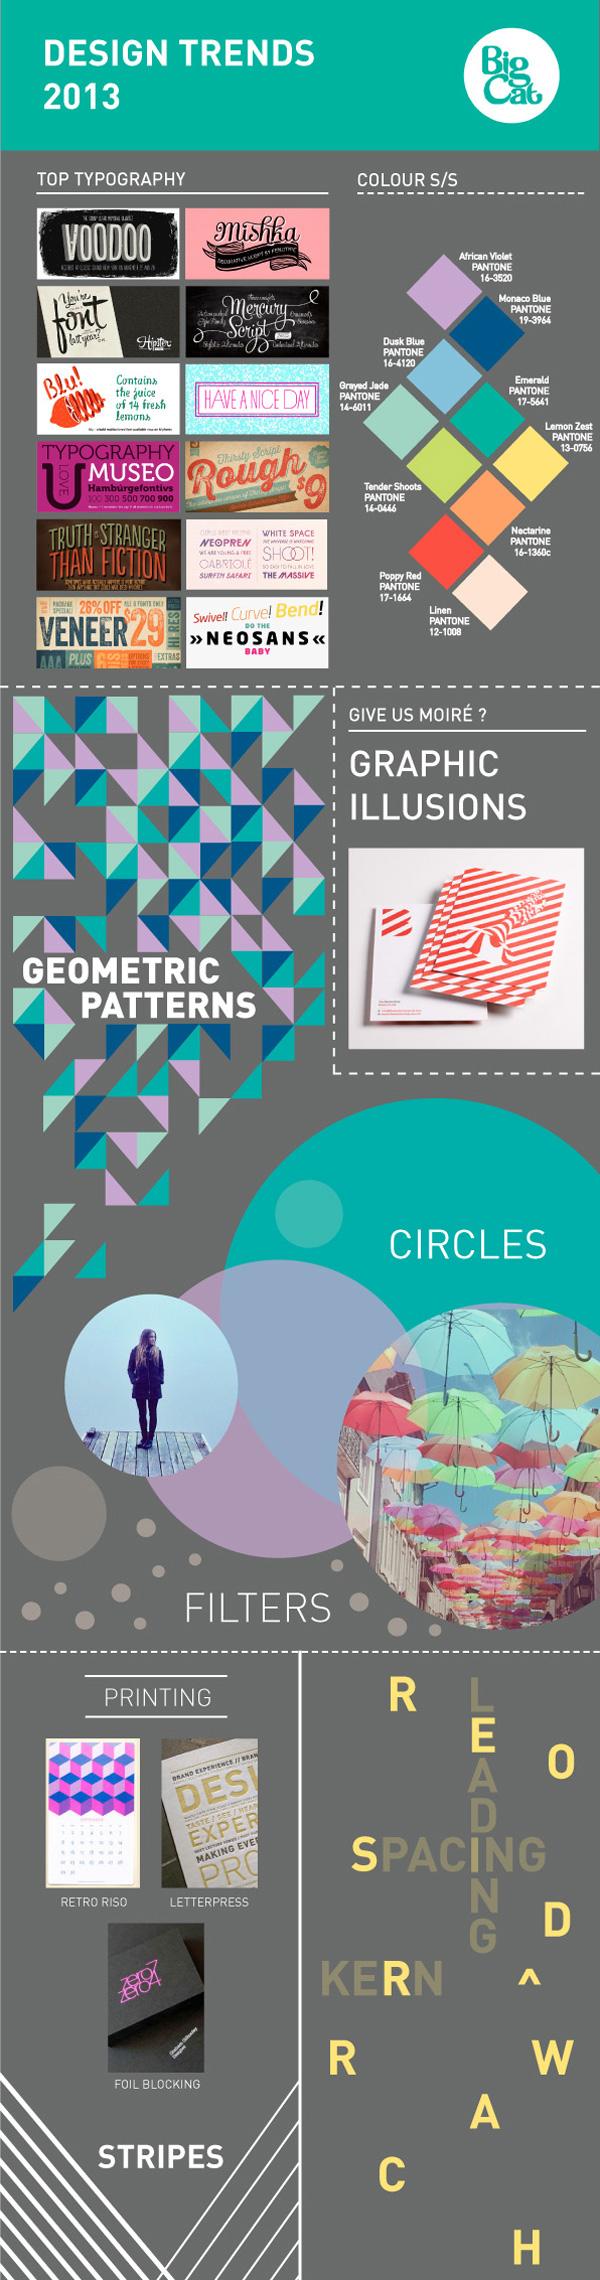 designTrends2013-G